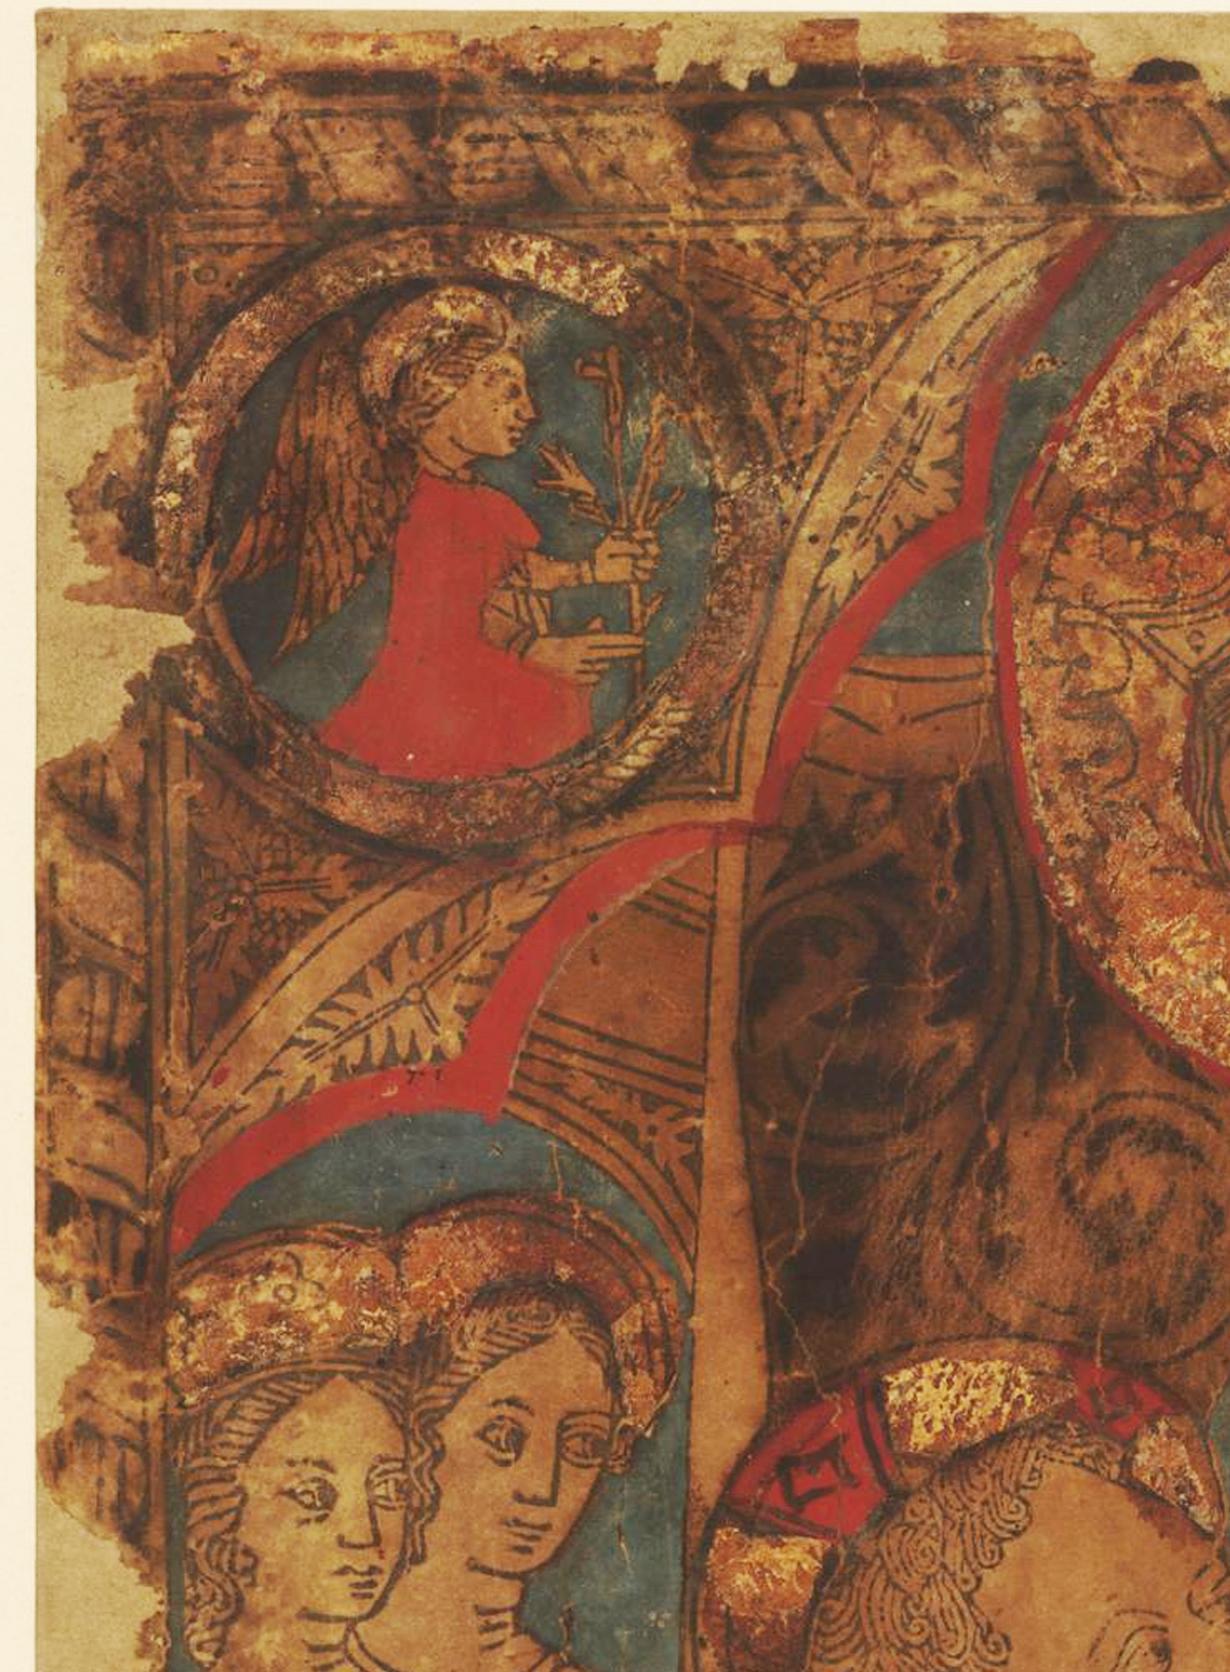 2B Italian School Virgin enthroned suckling her Child c1450 hand coloured woodcute BM detail